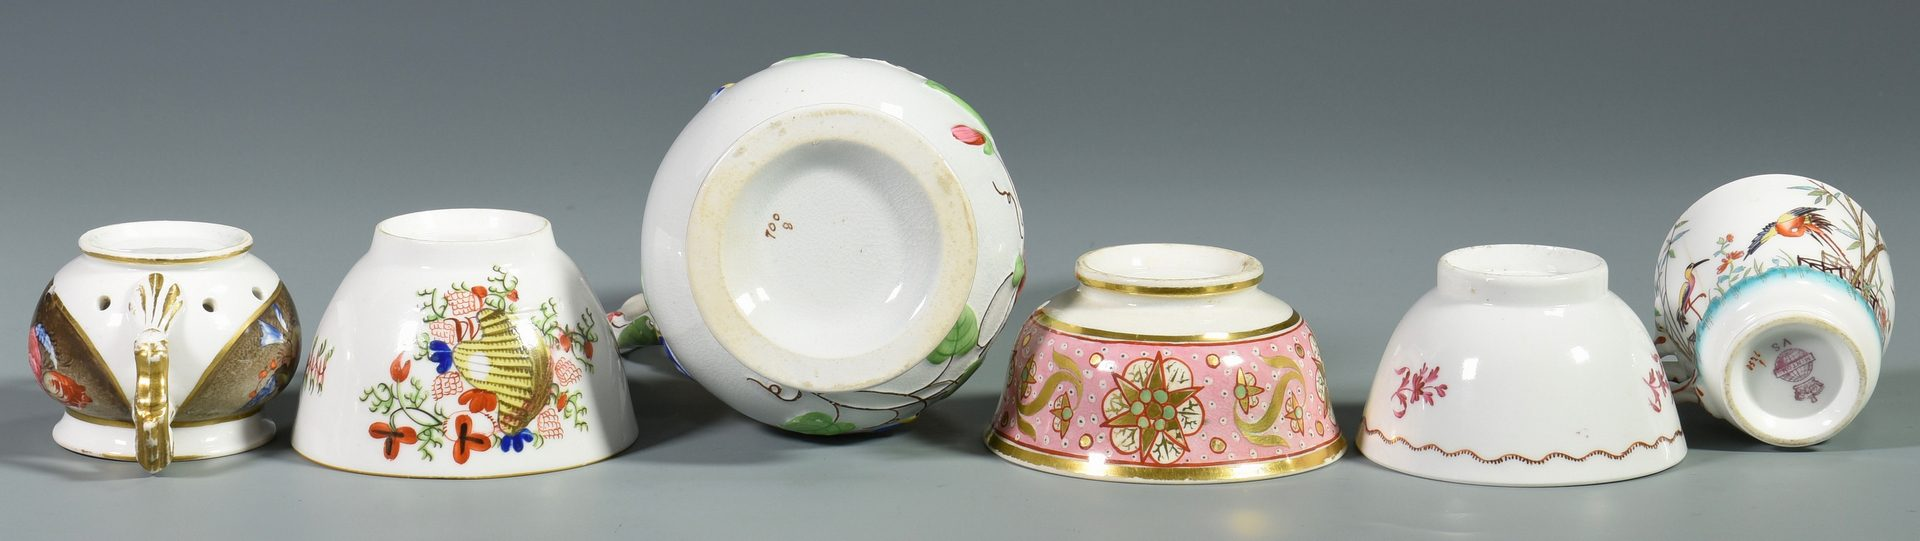 Lot 80: Assd. Group of European Porcelain, 16 items